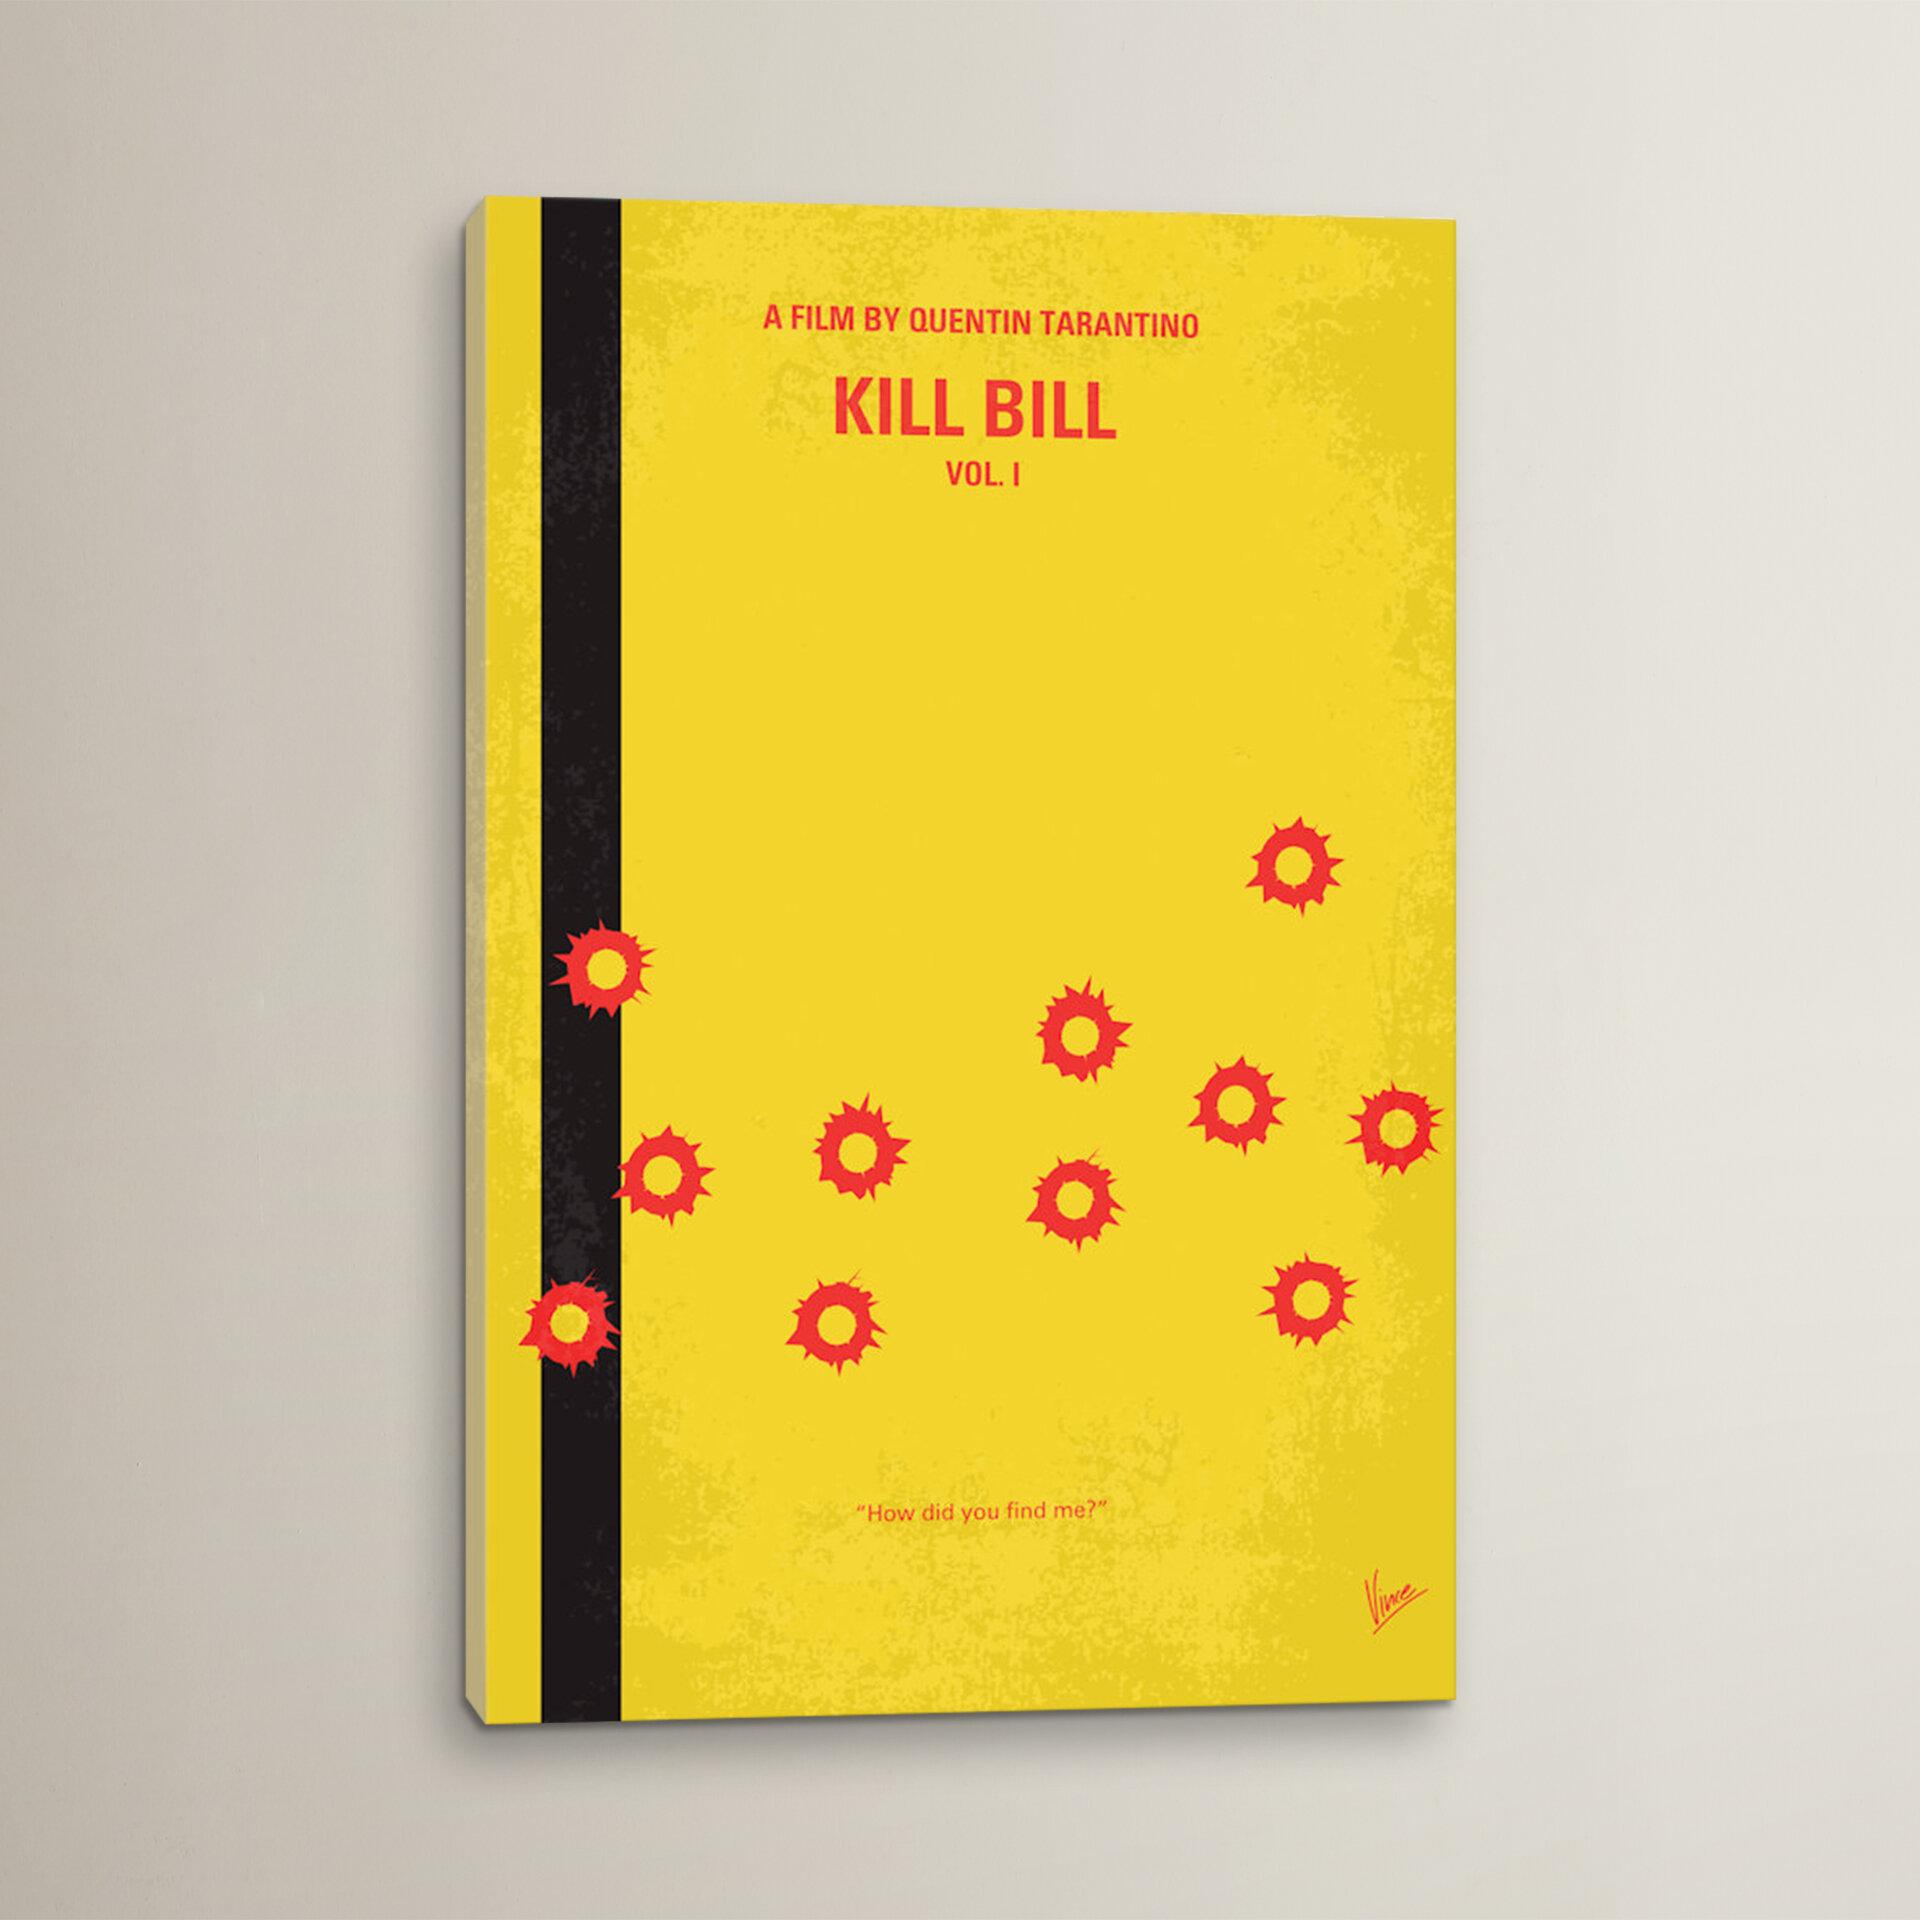 Kill Bill 1 Movie Poster Canvas Picture Art Print Premium Quality